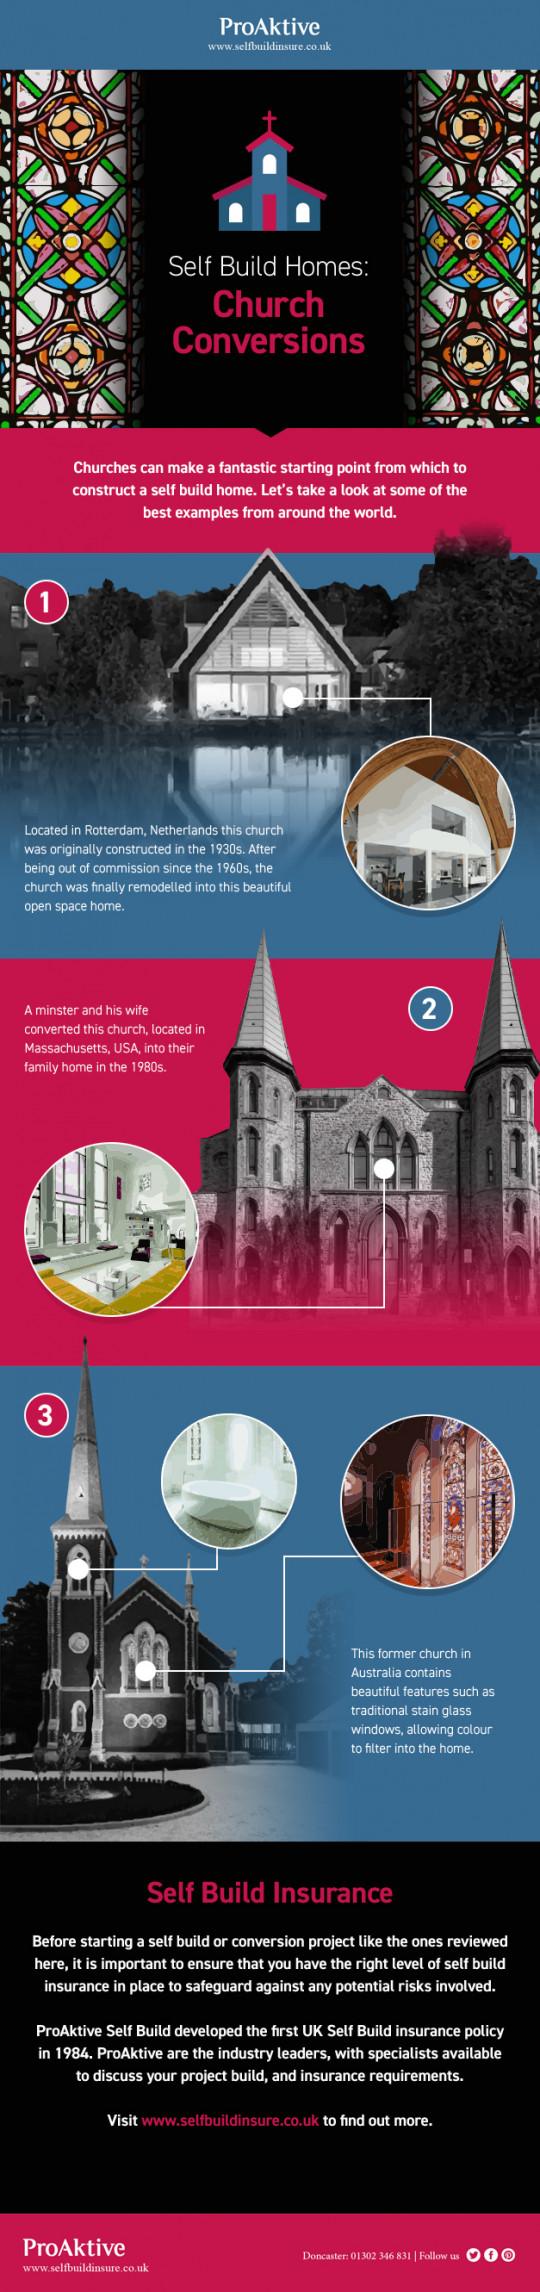 Self Build Homes: Church Conversions